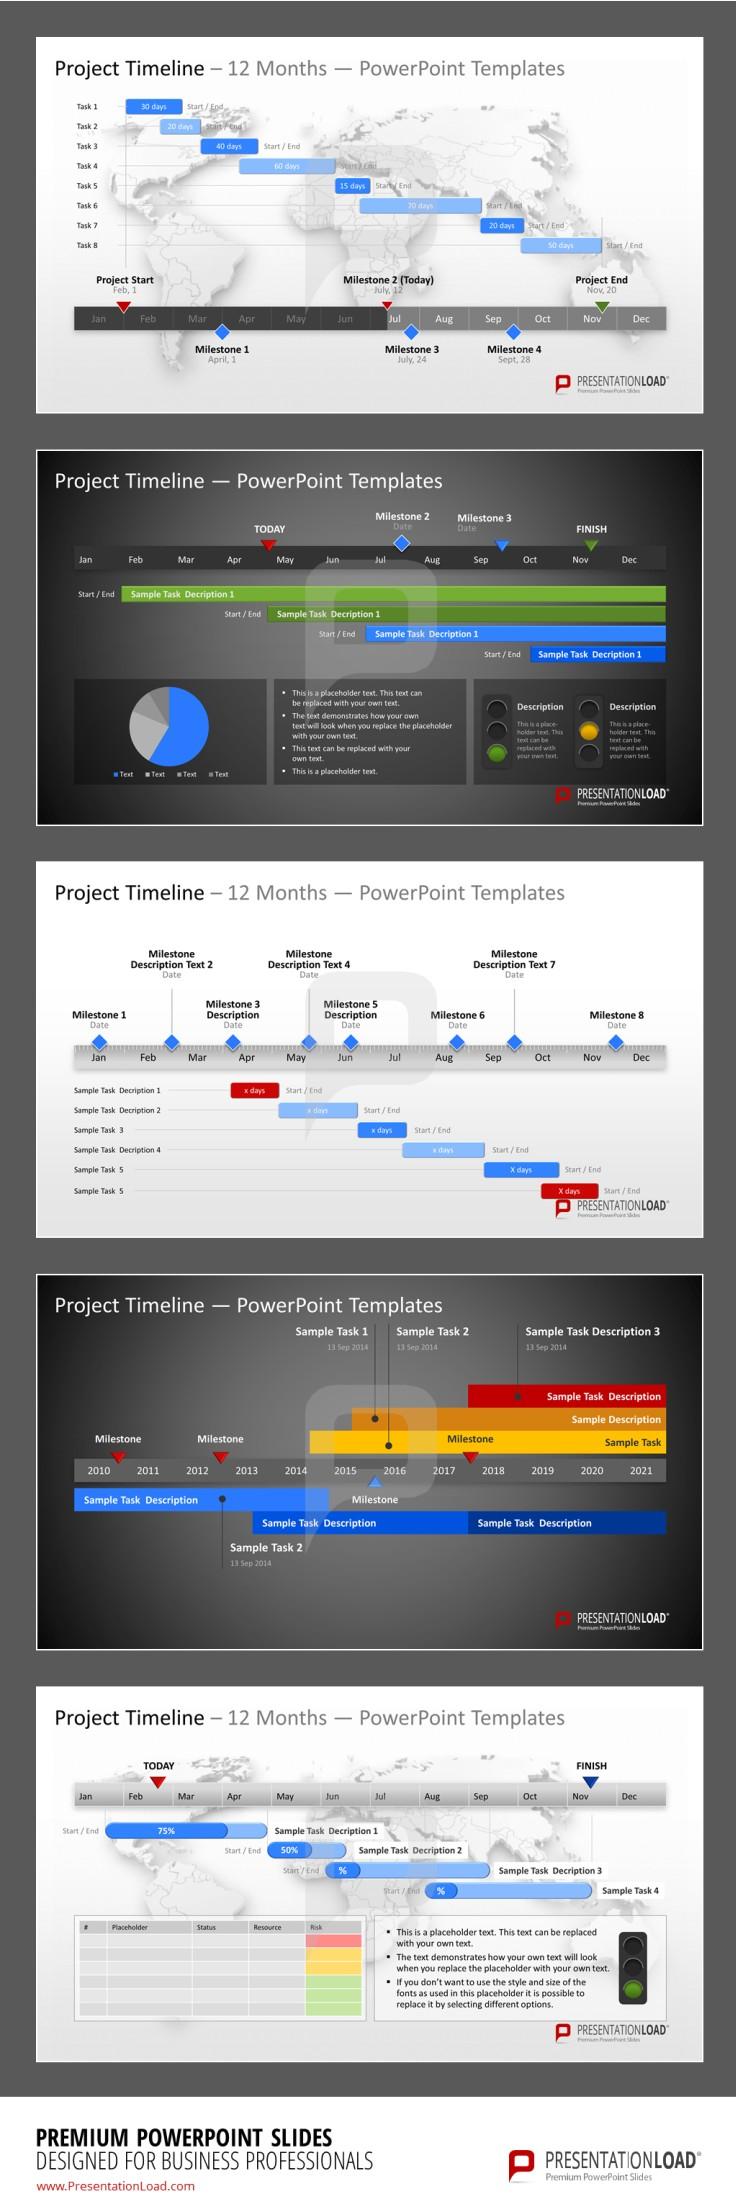 Project Timeline Powerpoint Template Presentationload Www